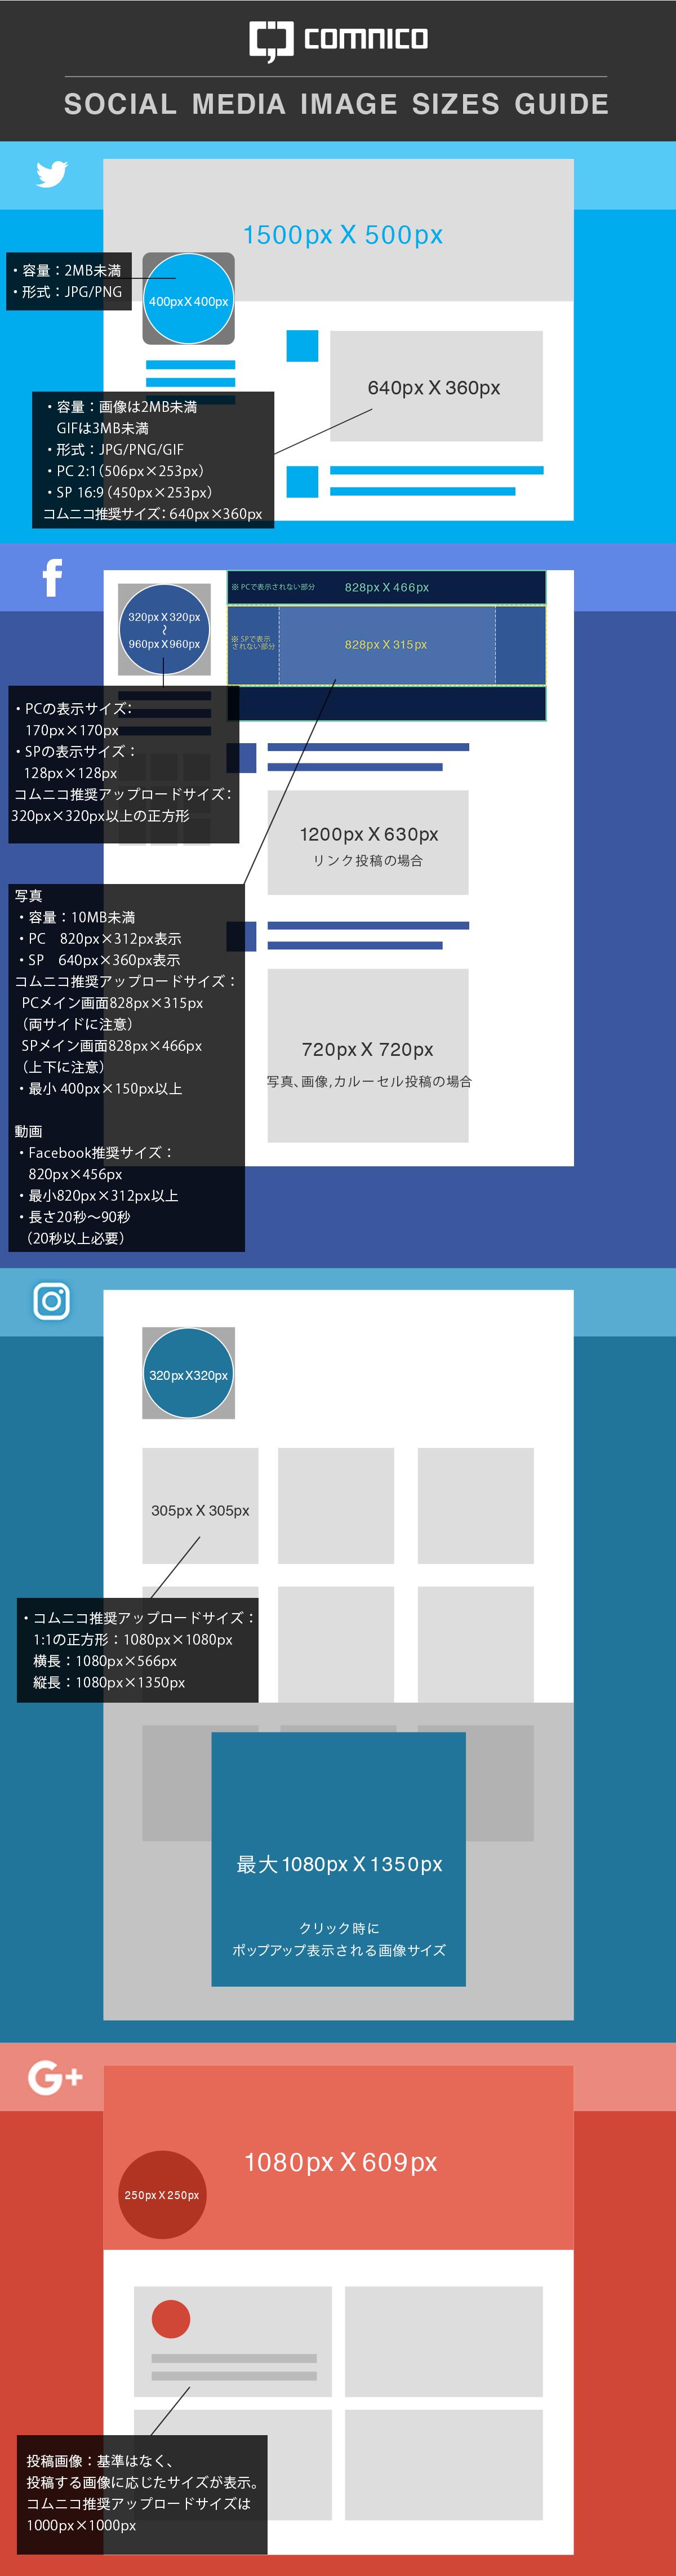 Facebook、Twitter、Instagram、Google画像サイズ